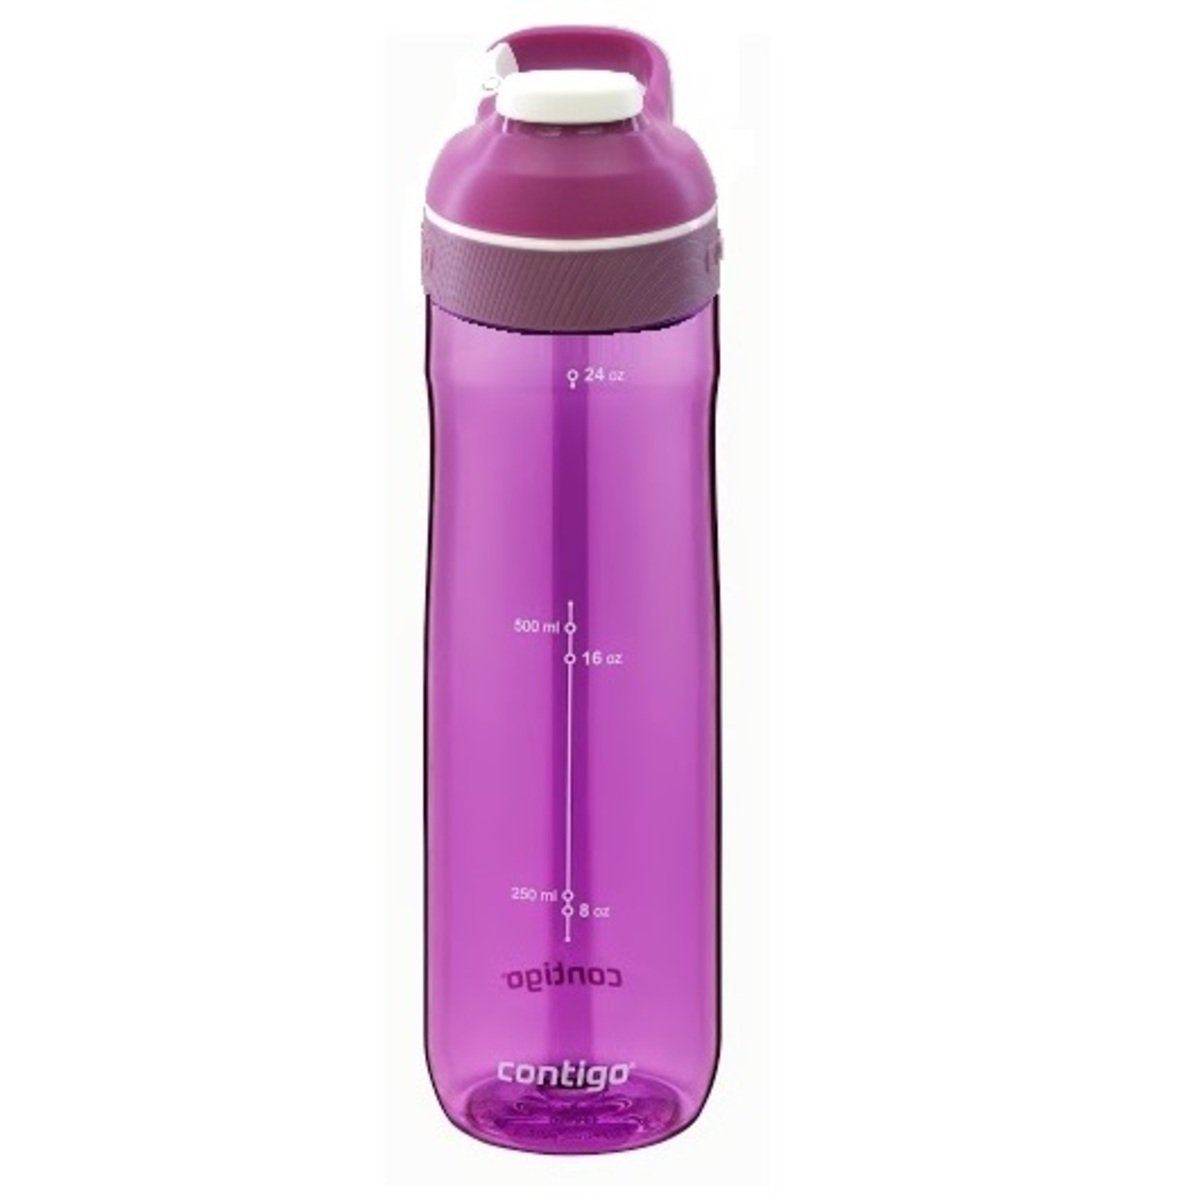 Cortland 運動偷閒杯 - 紫蘭花杯紫蘭花蓋